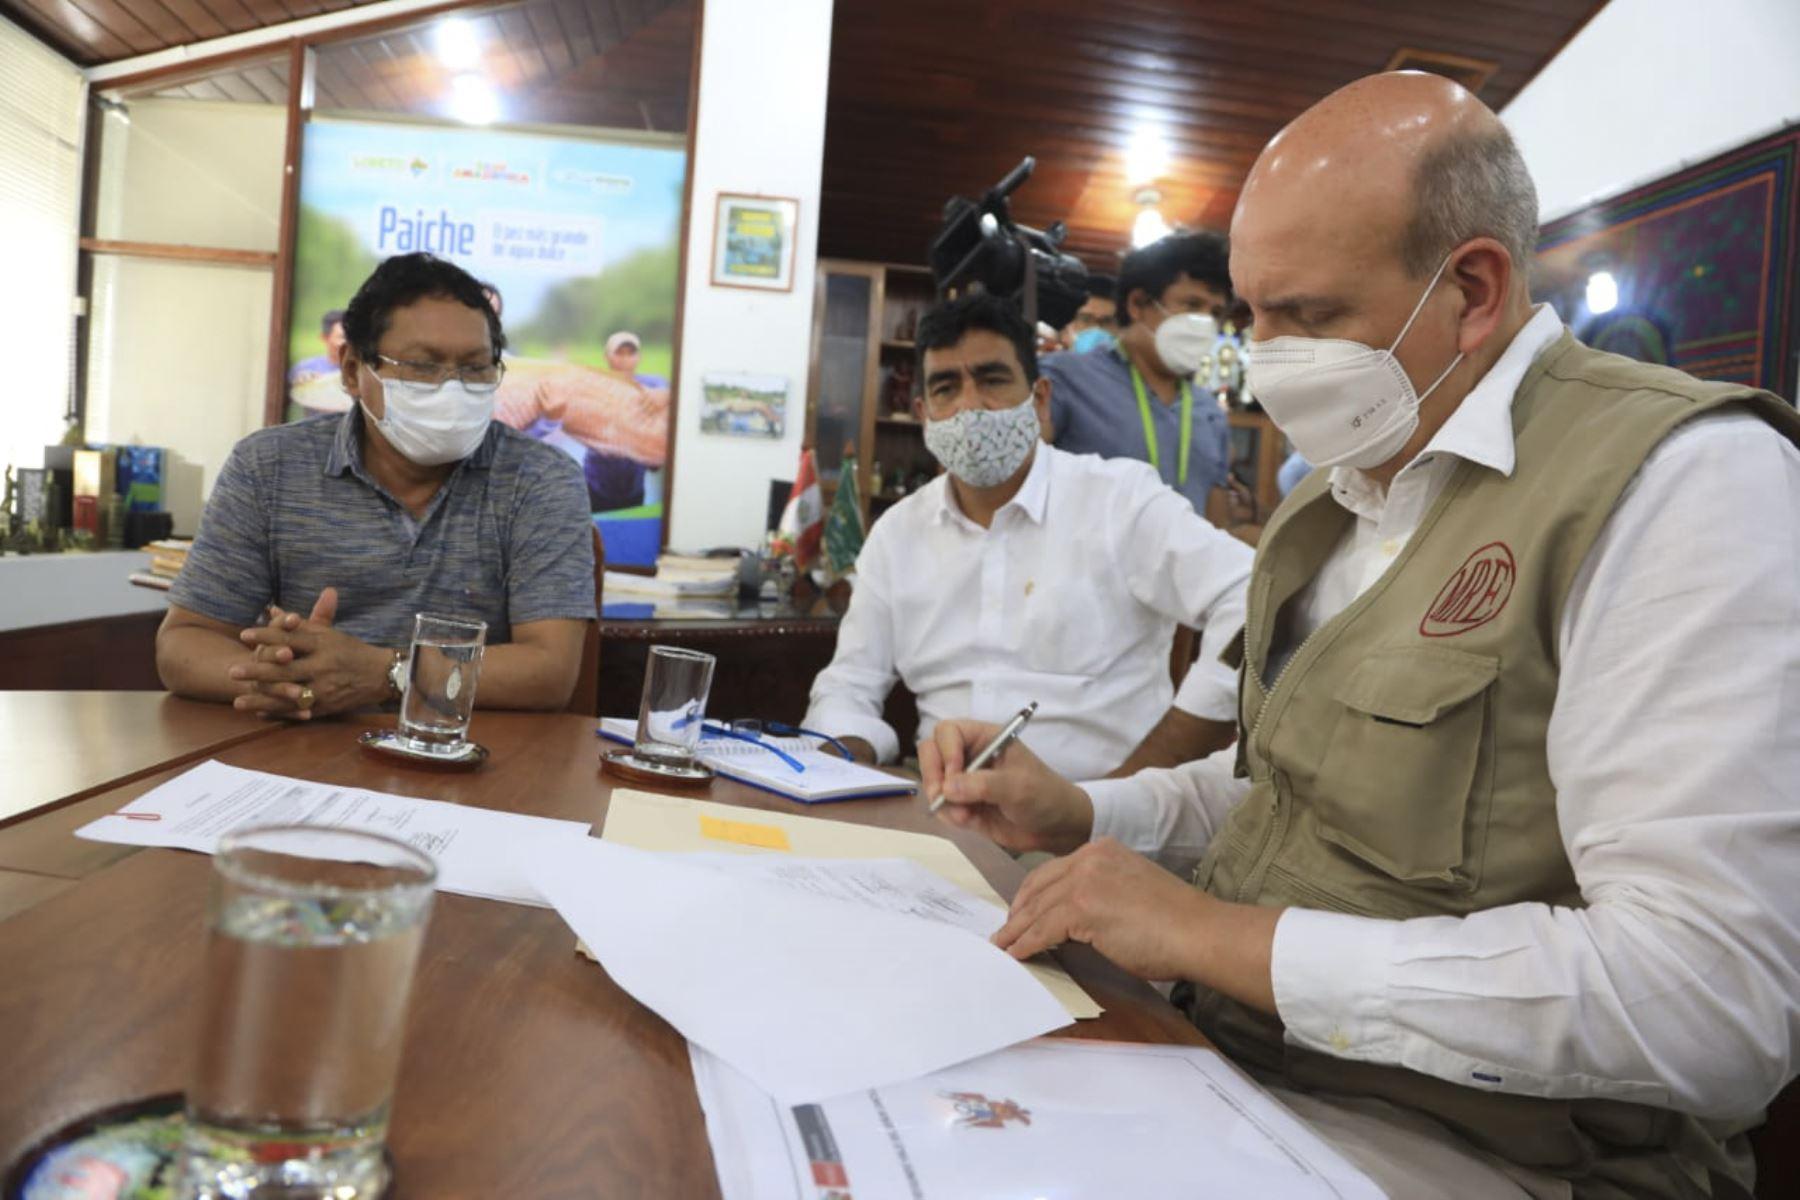 Canciller coordina con gobernador de Loreto estrategias para reactivación económica | Noticias